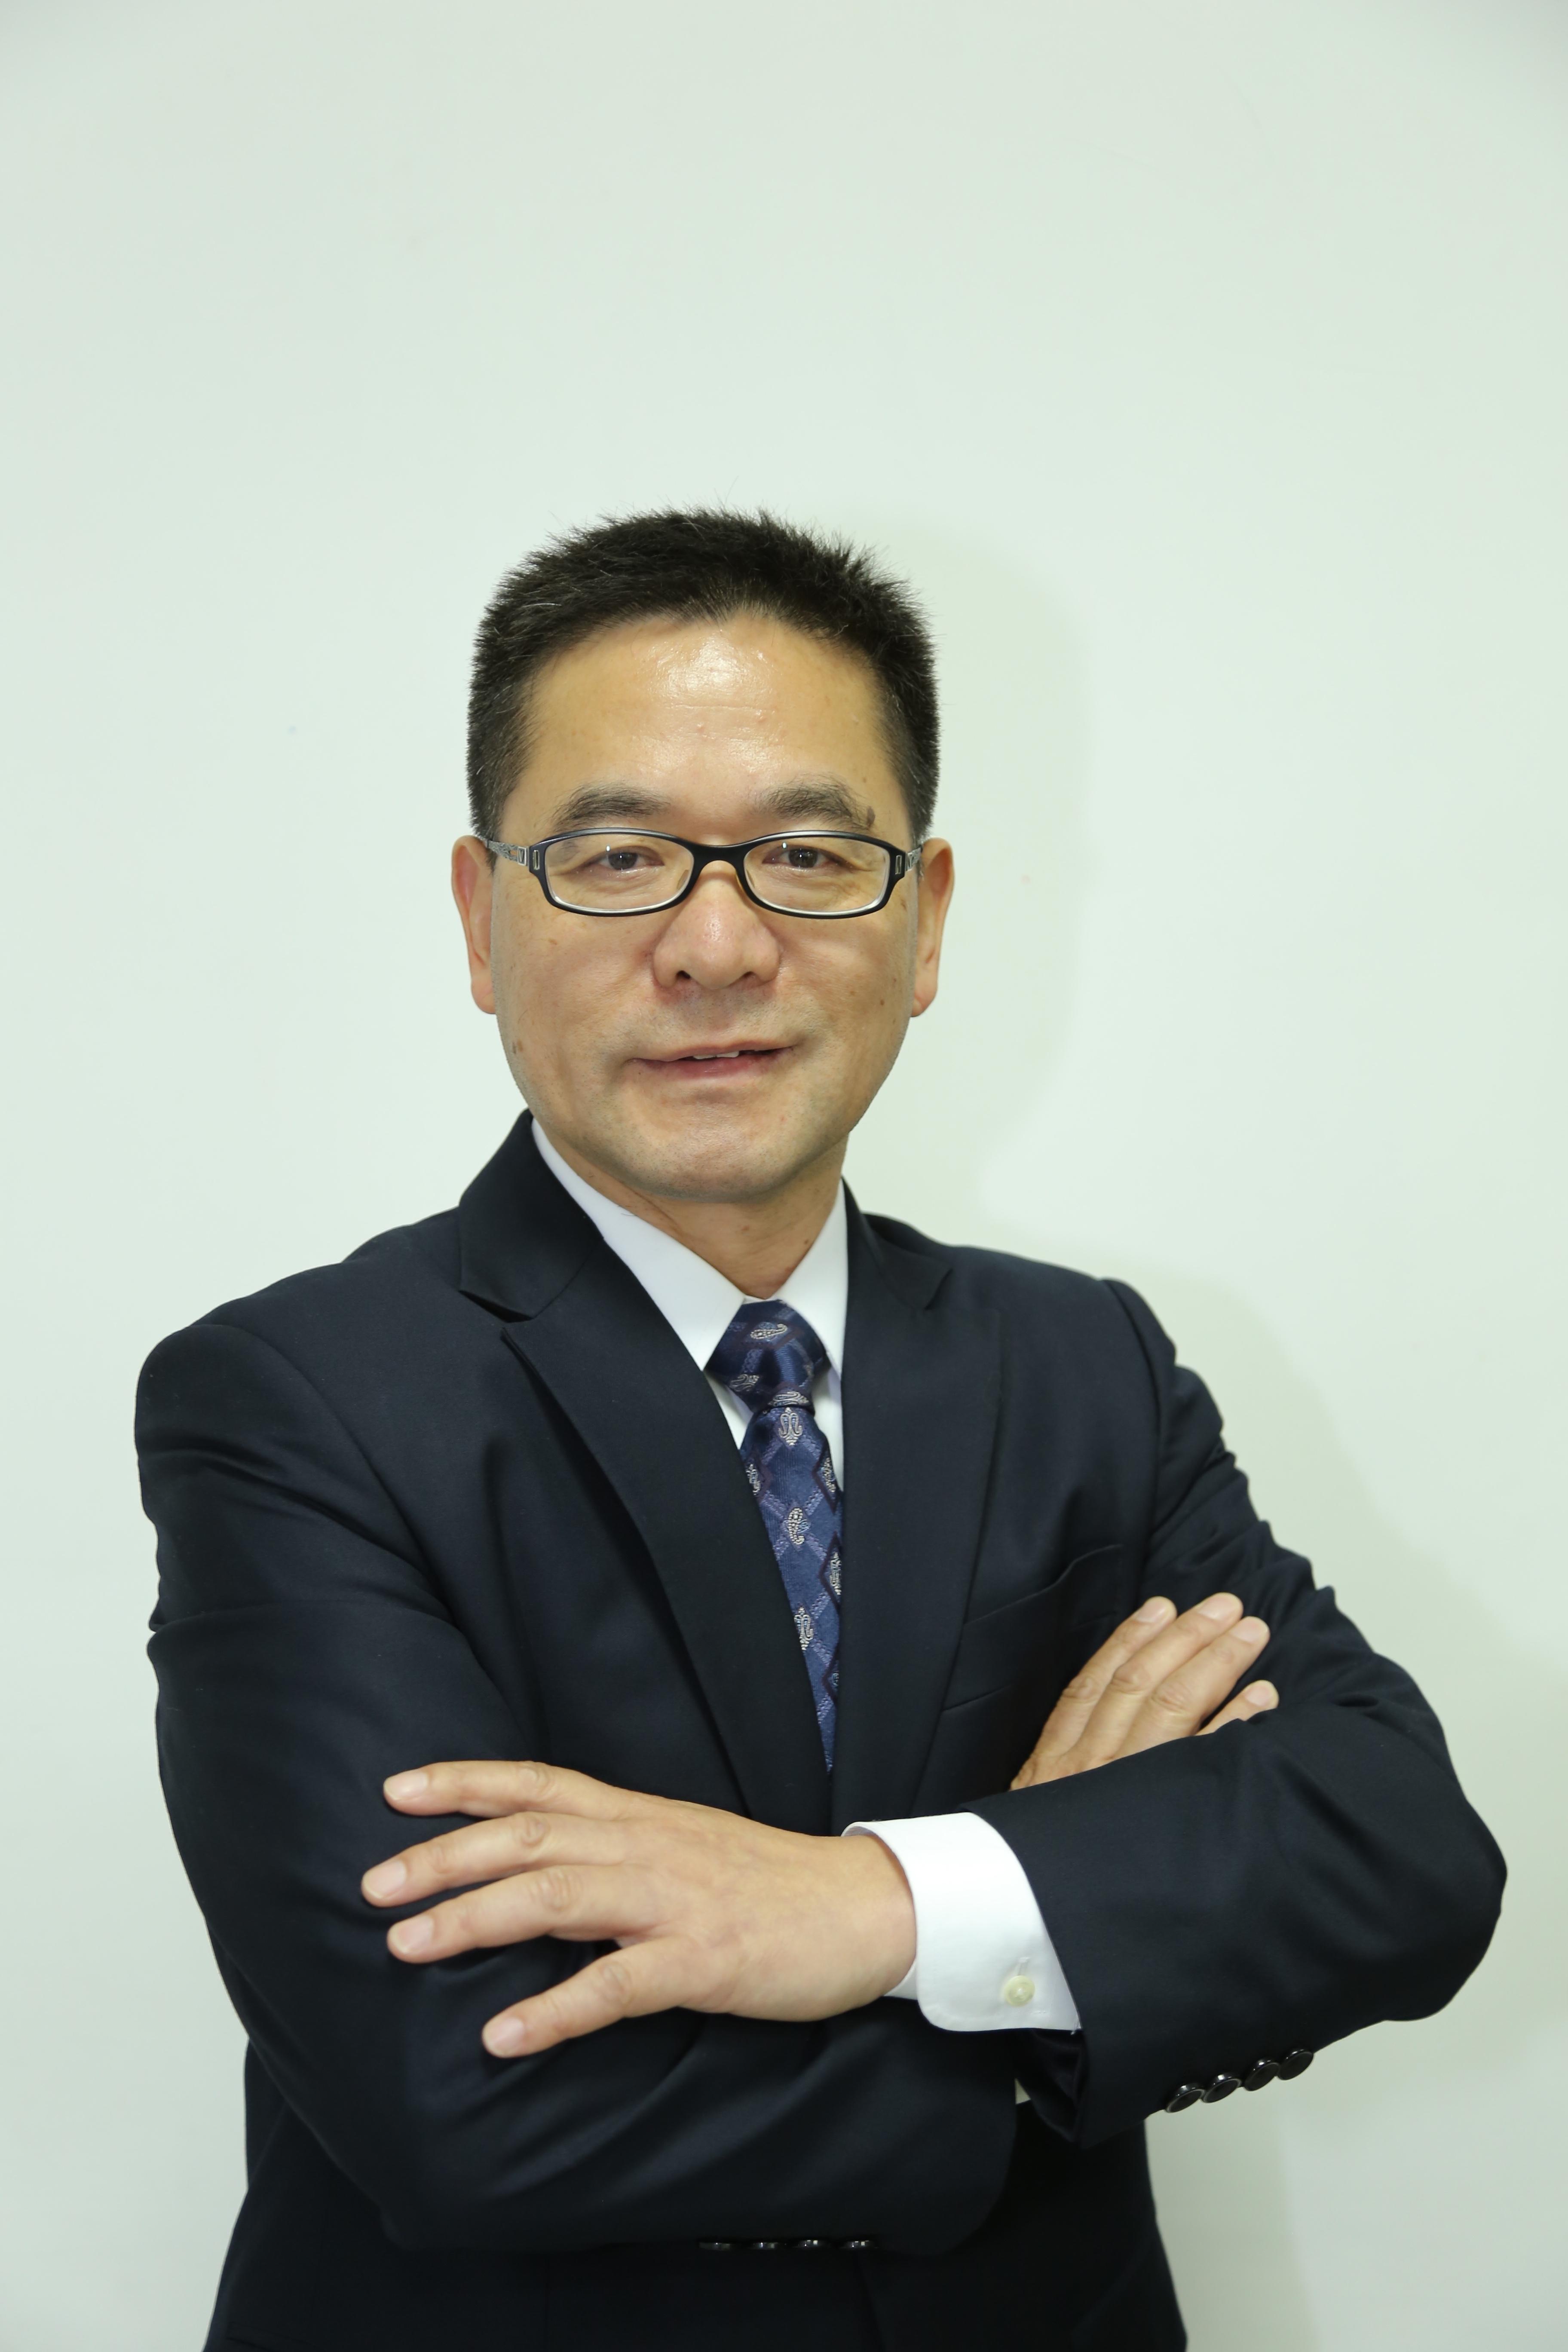 Li Li, vice president of R&D, Geely Auto